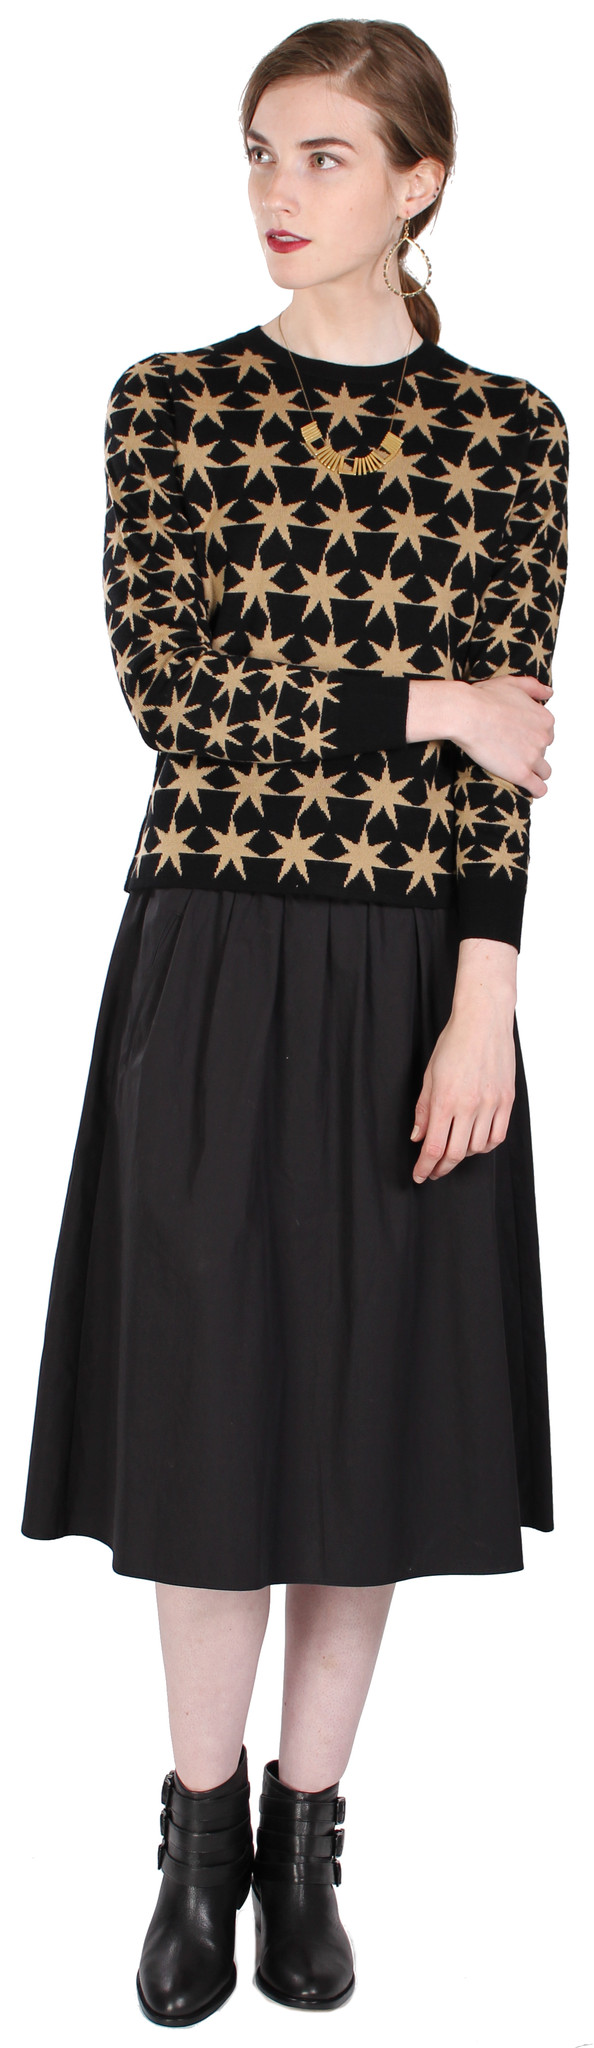 Sonia by Sonia Rykiel Jacquard Stars Sweater